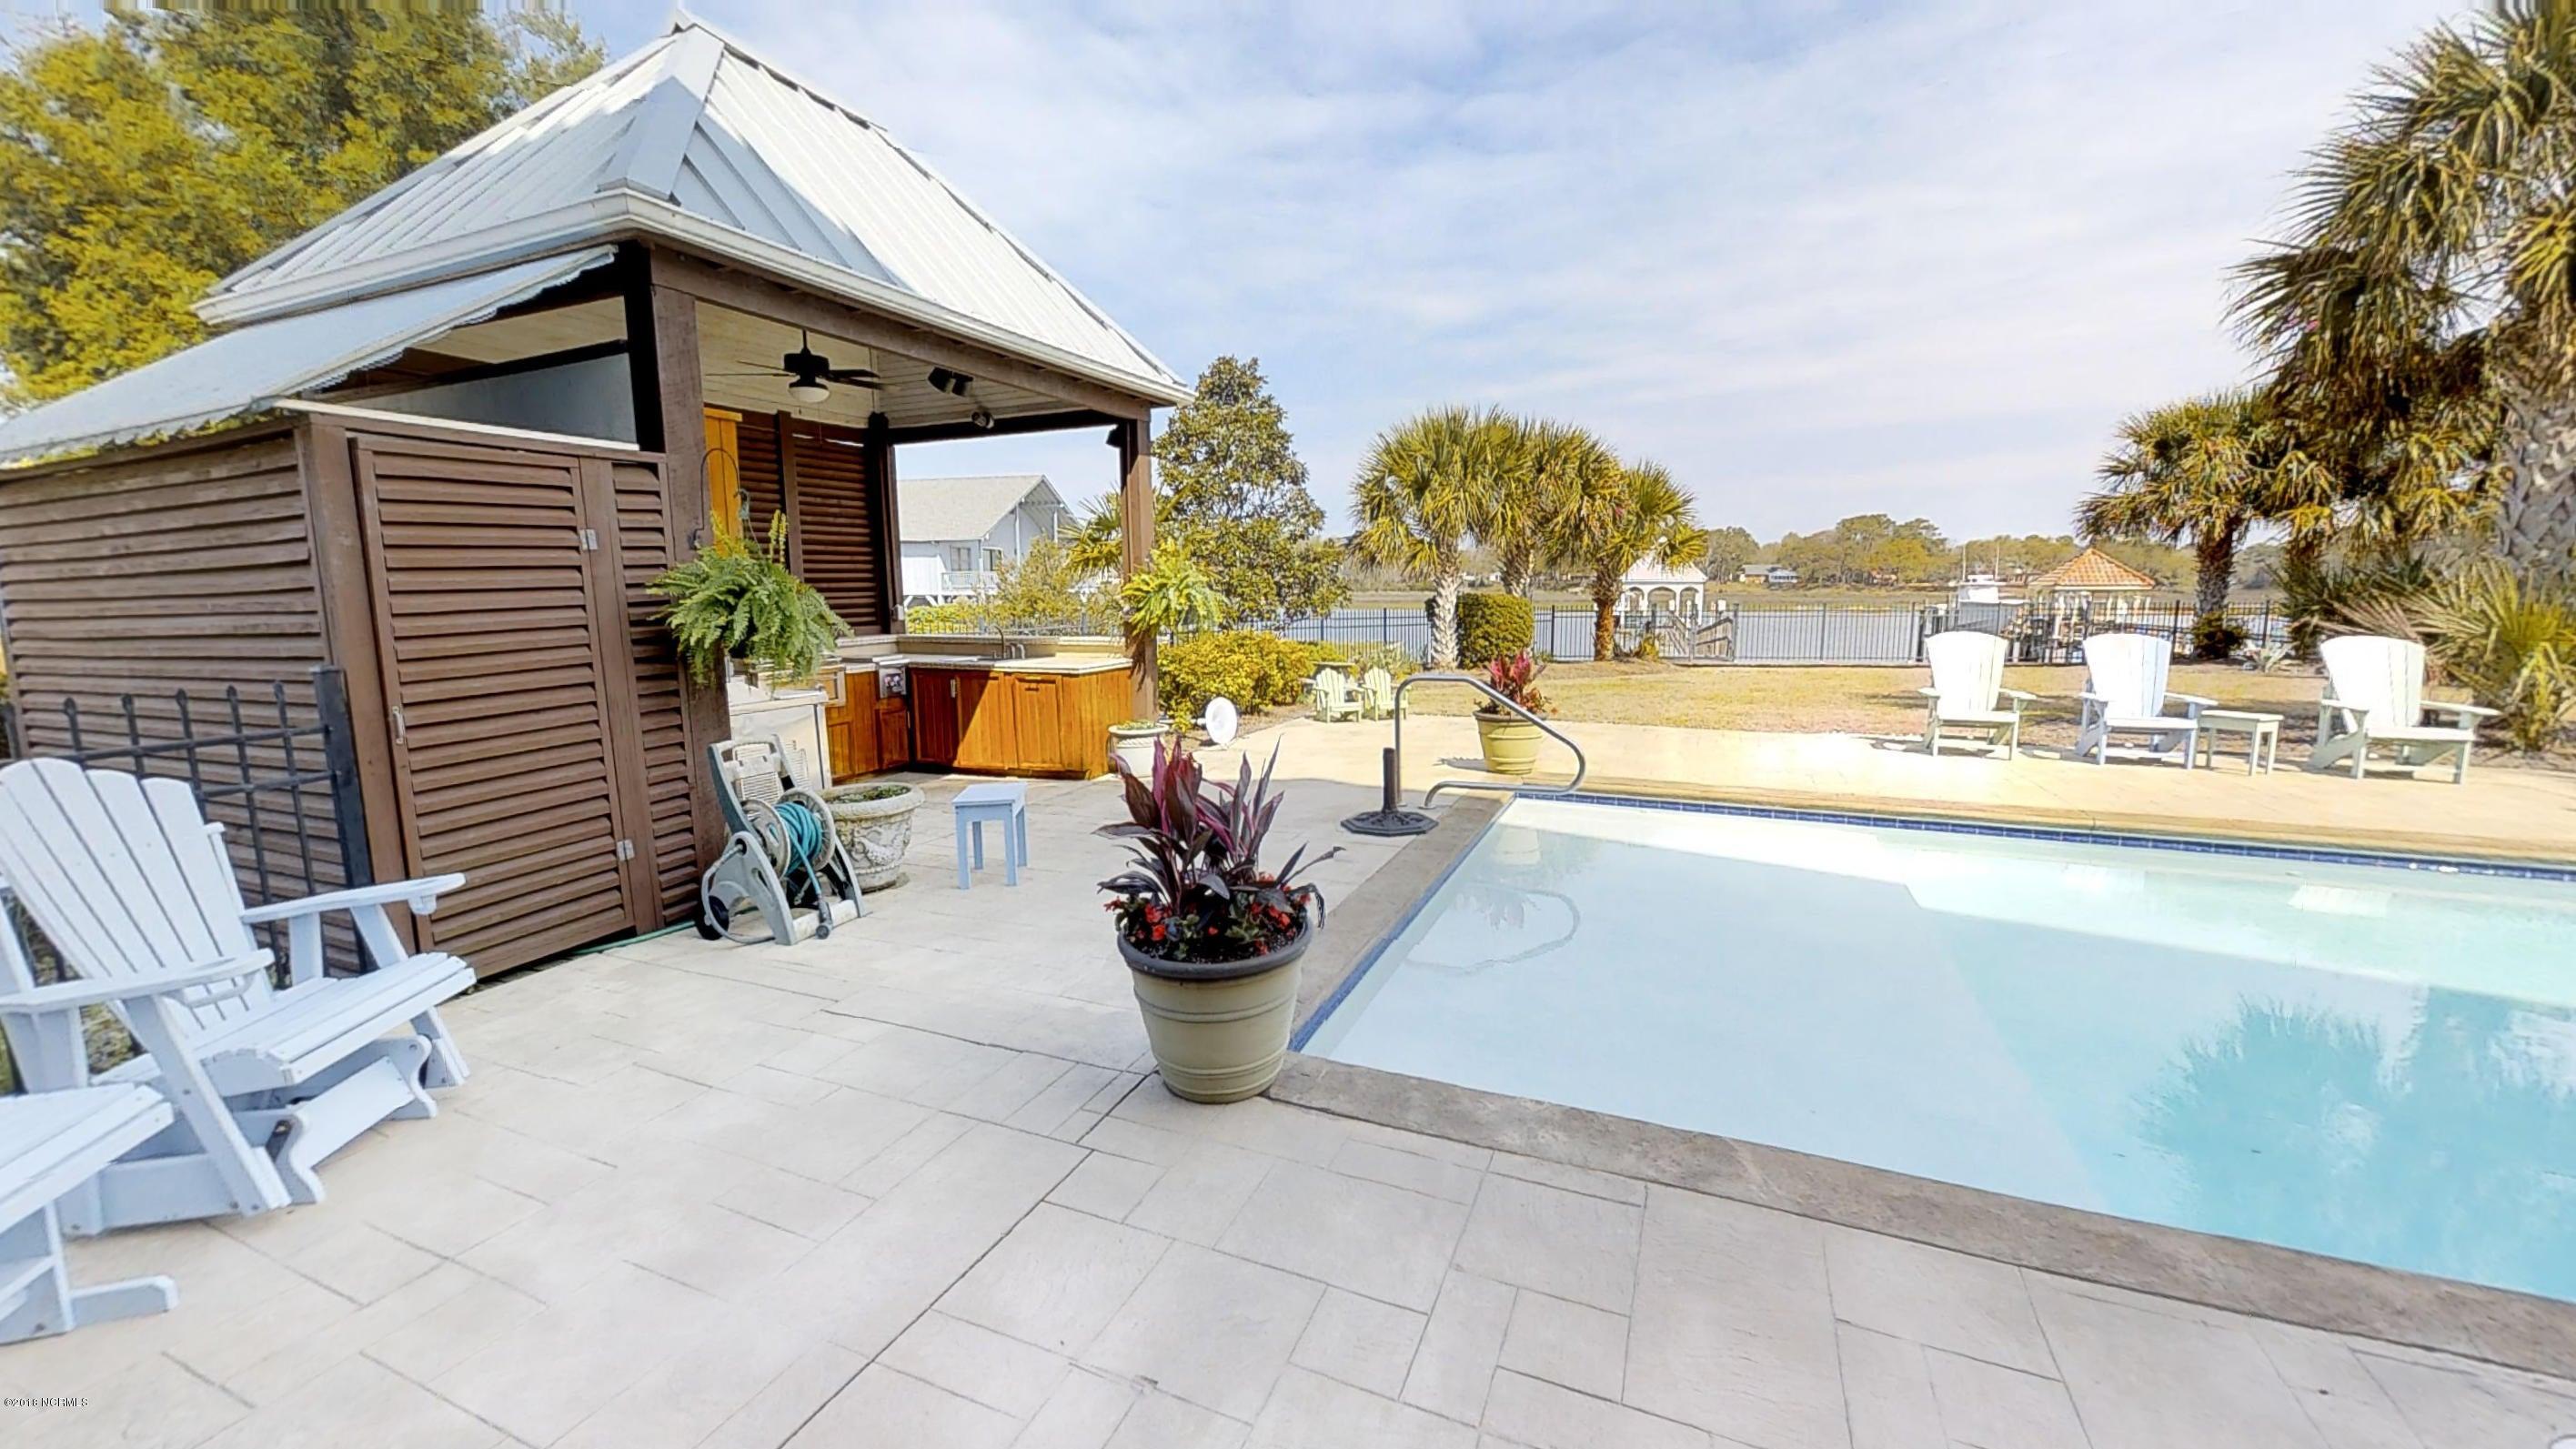 Ocean Isle Beach Real Estate - http://cdn.resize.sparkplatform.com/ncr/1024x768/true/20180414120425637433000000-o.jpg